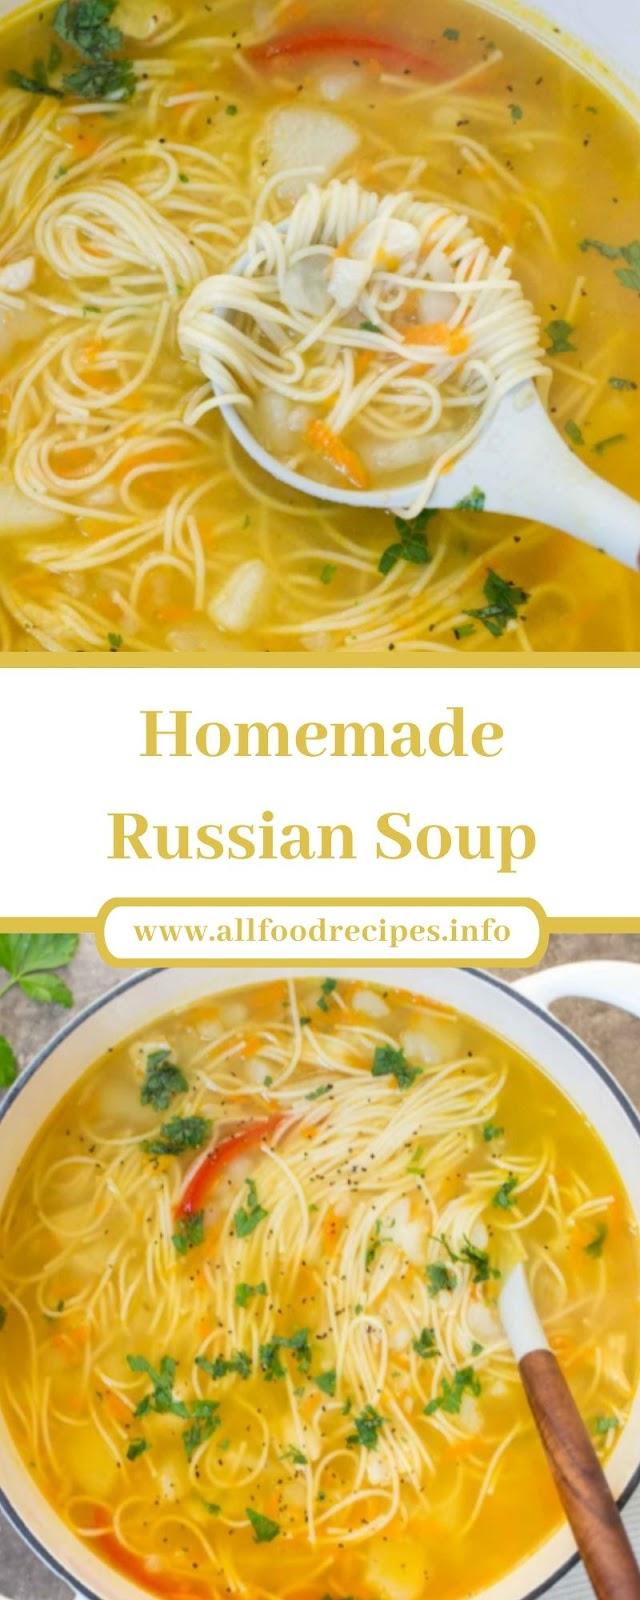 Homemade Russian Soup